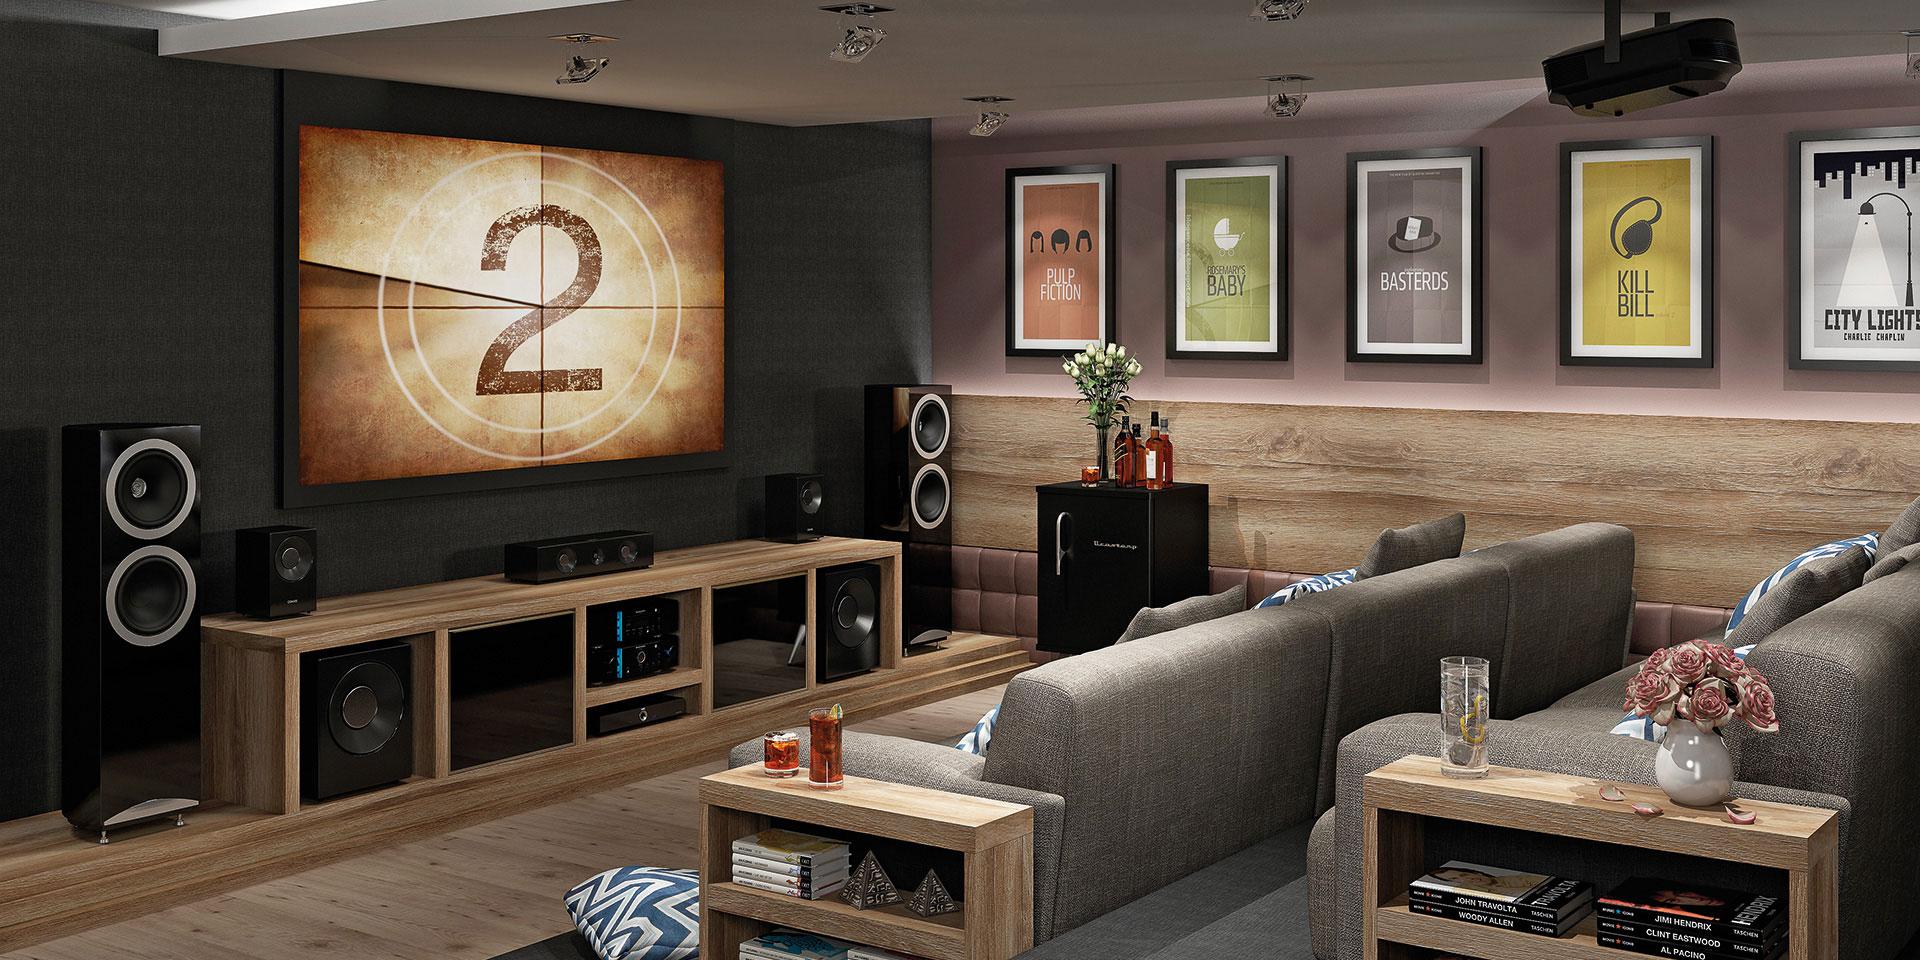 Mezzo Castani e painel da TV em Preto